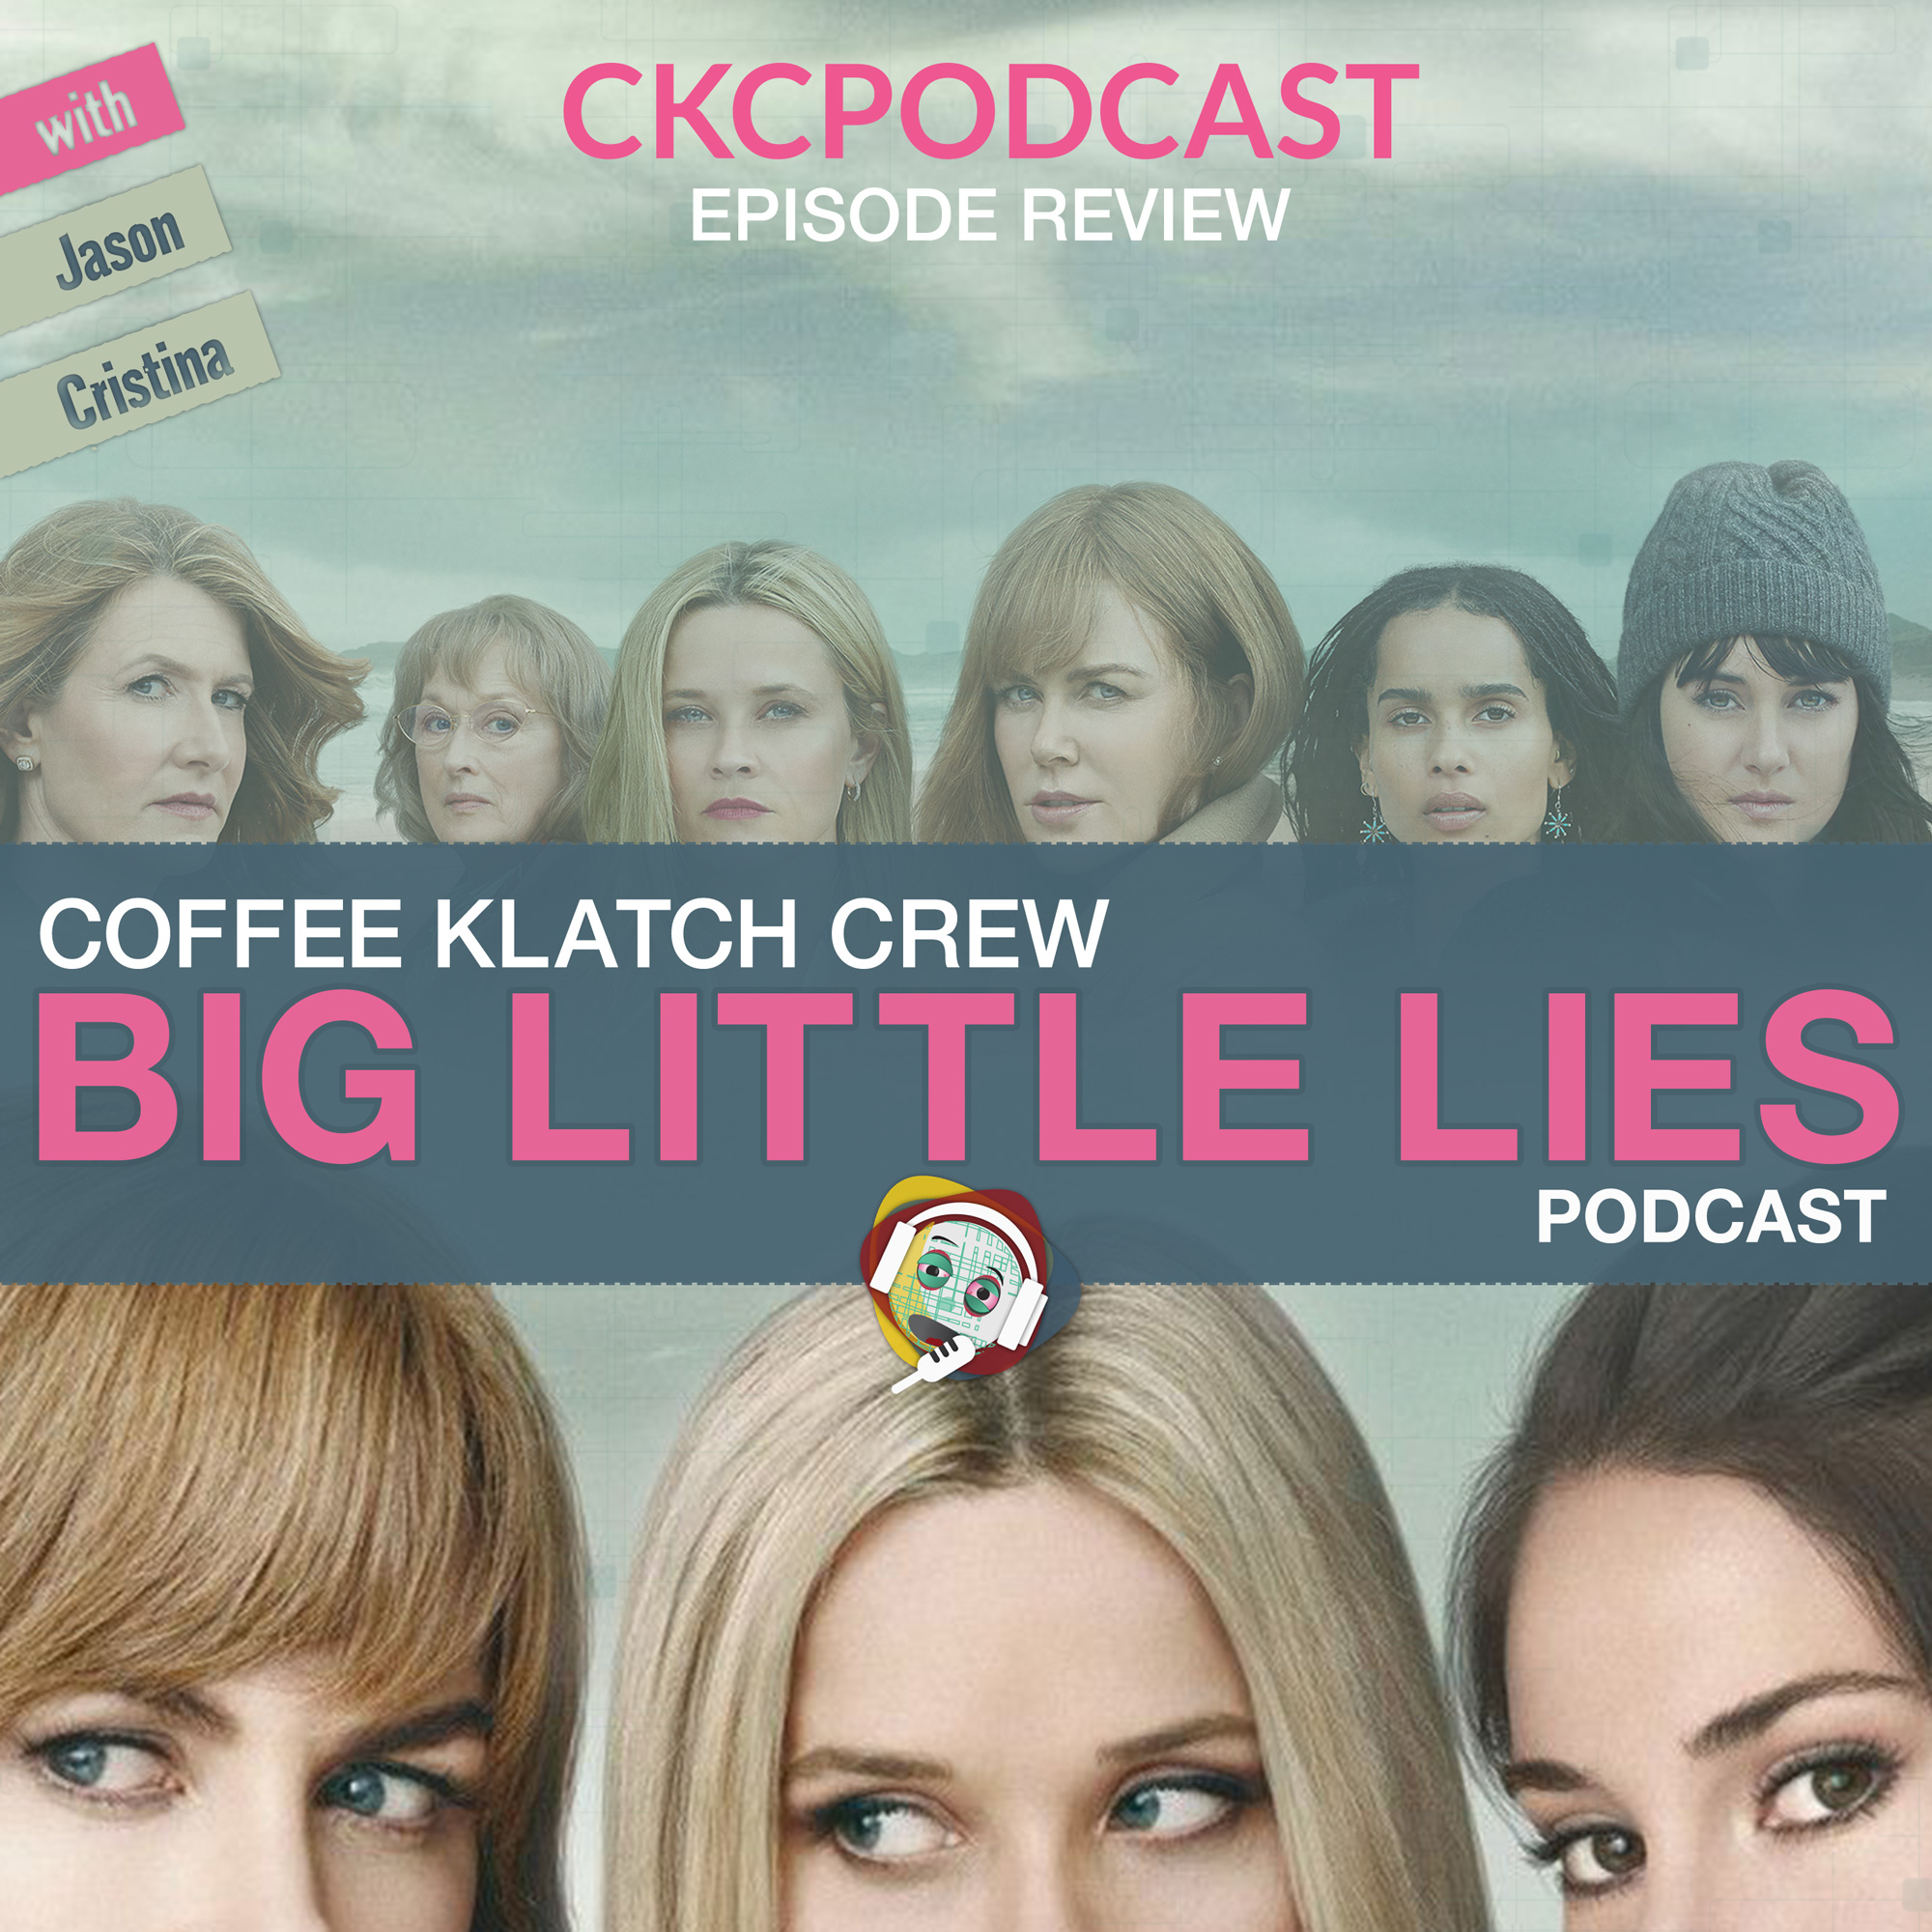 Big Little Lies Review   Listen via Stitcher for Podcasts